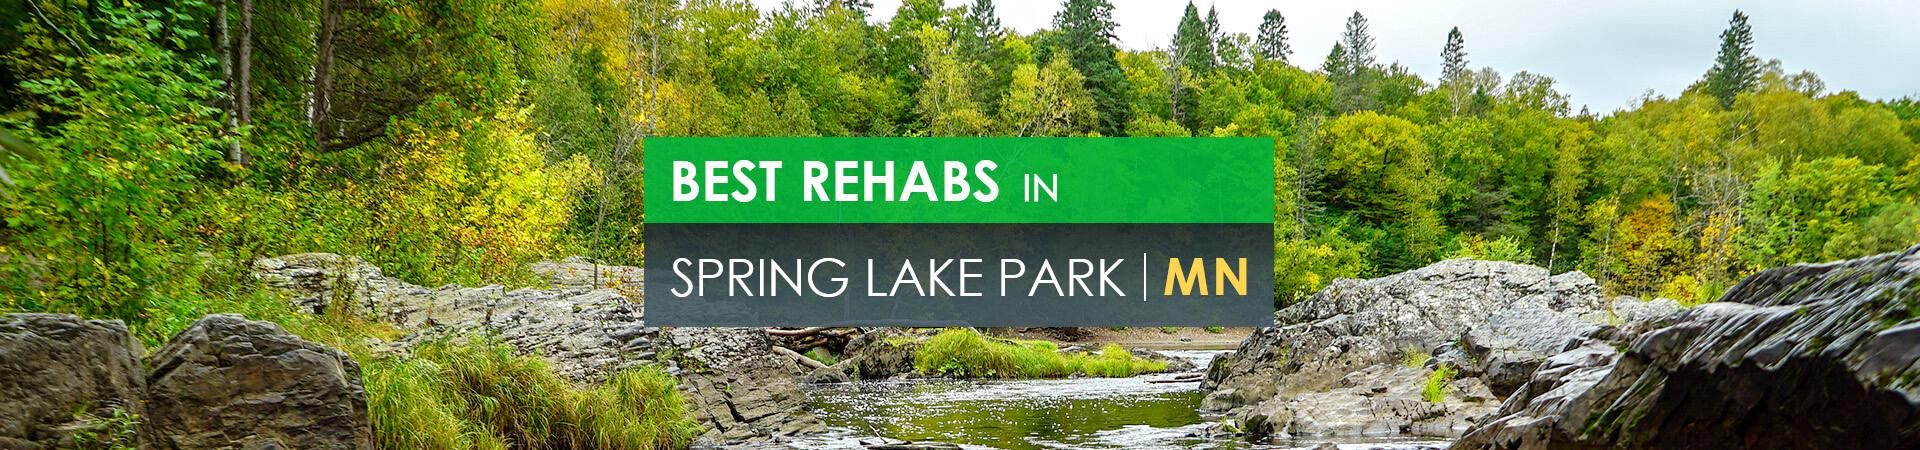 Best rehabs in Spring Lake Park, MN